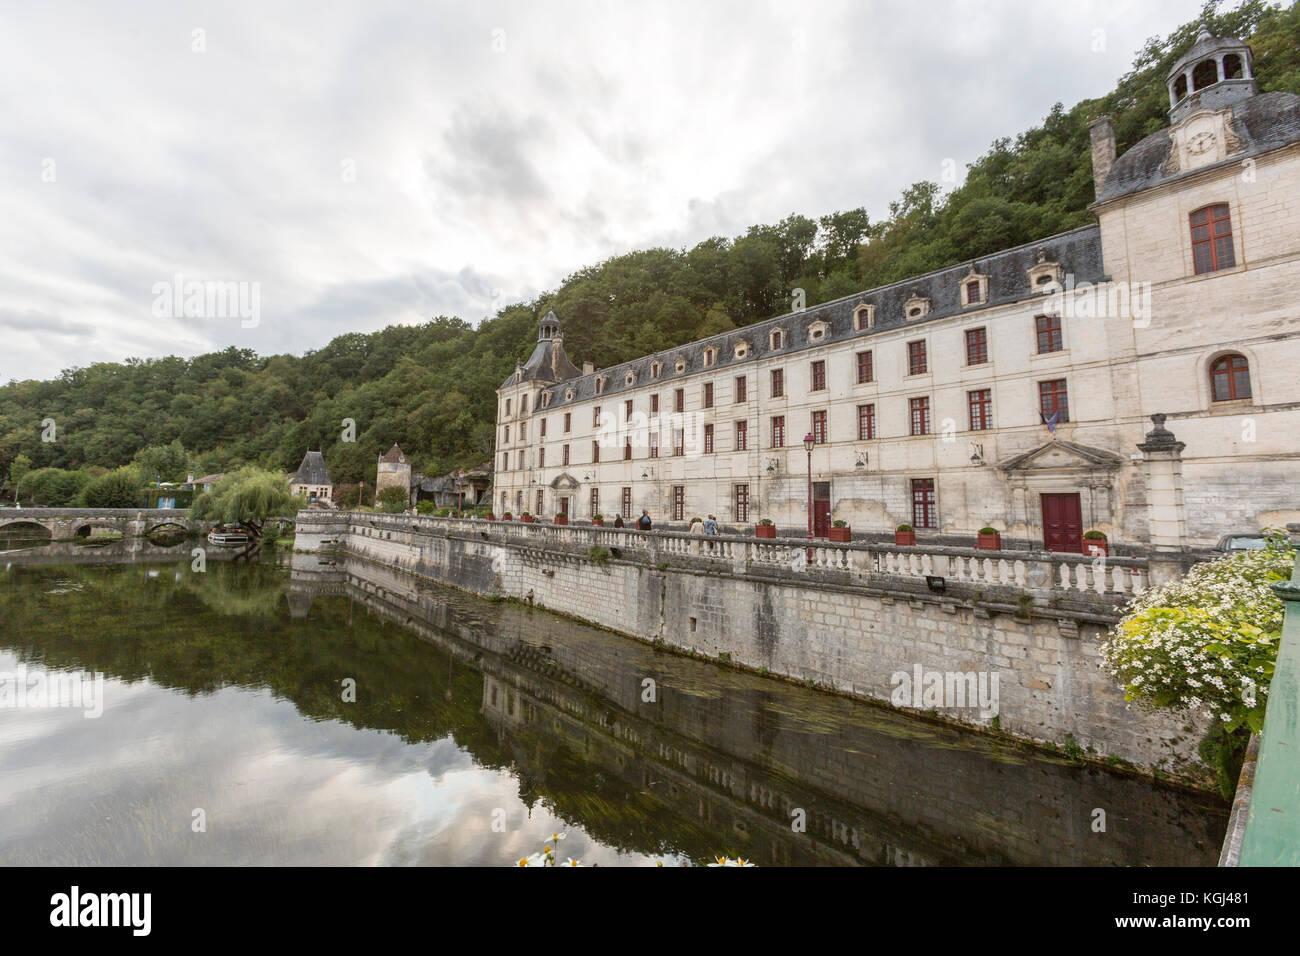 River Dronne and the Benedictine Abbey of Brantôme, Brantome, Dordogne - Stock Image